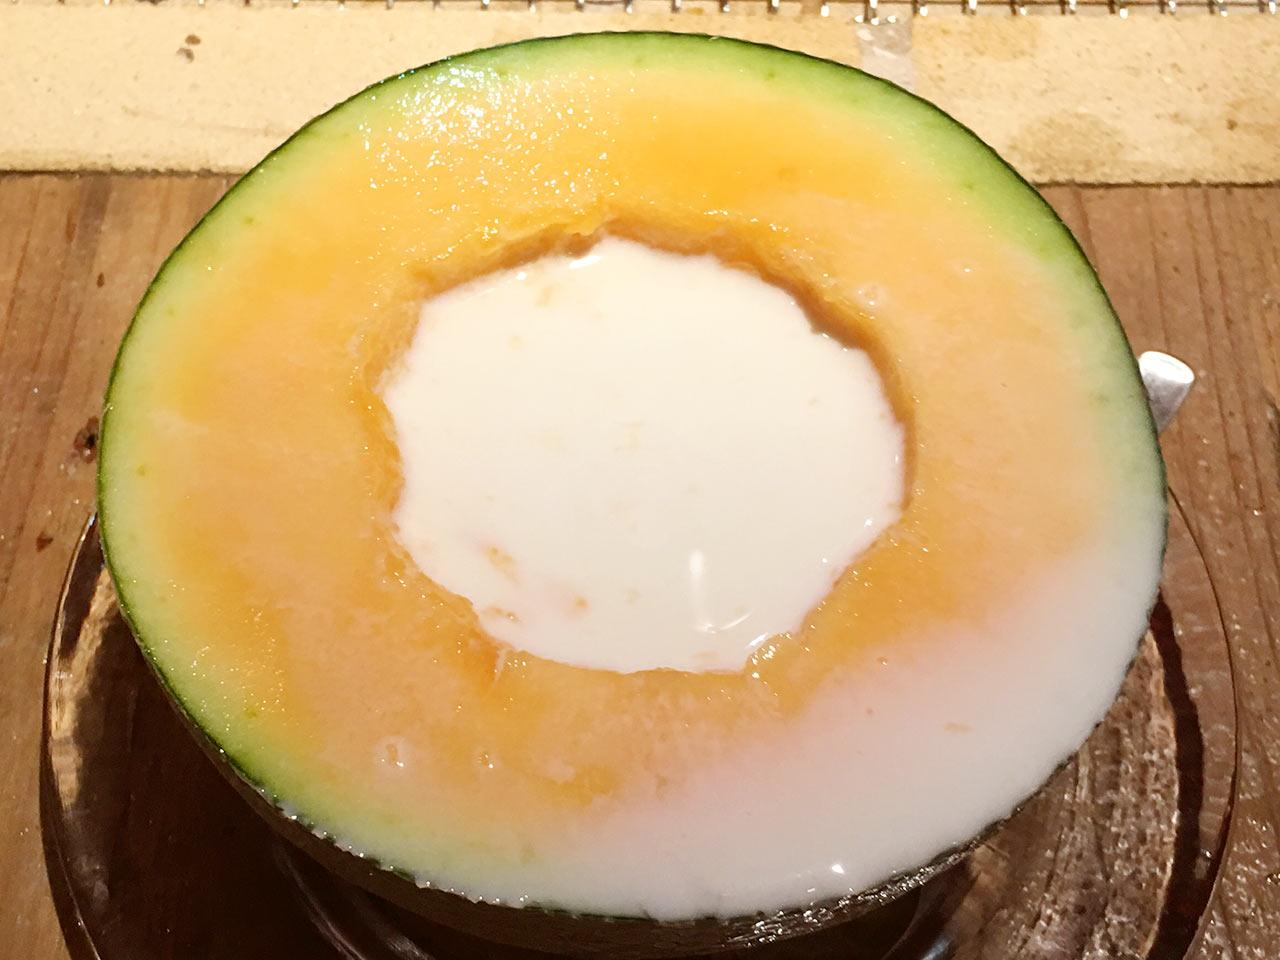 shinbashi-zenibako-bbq-desert01